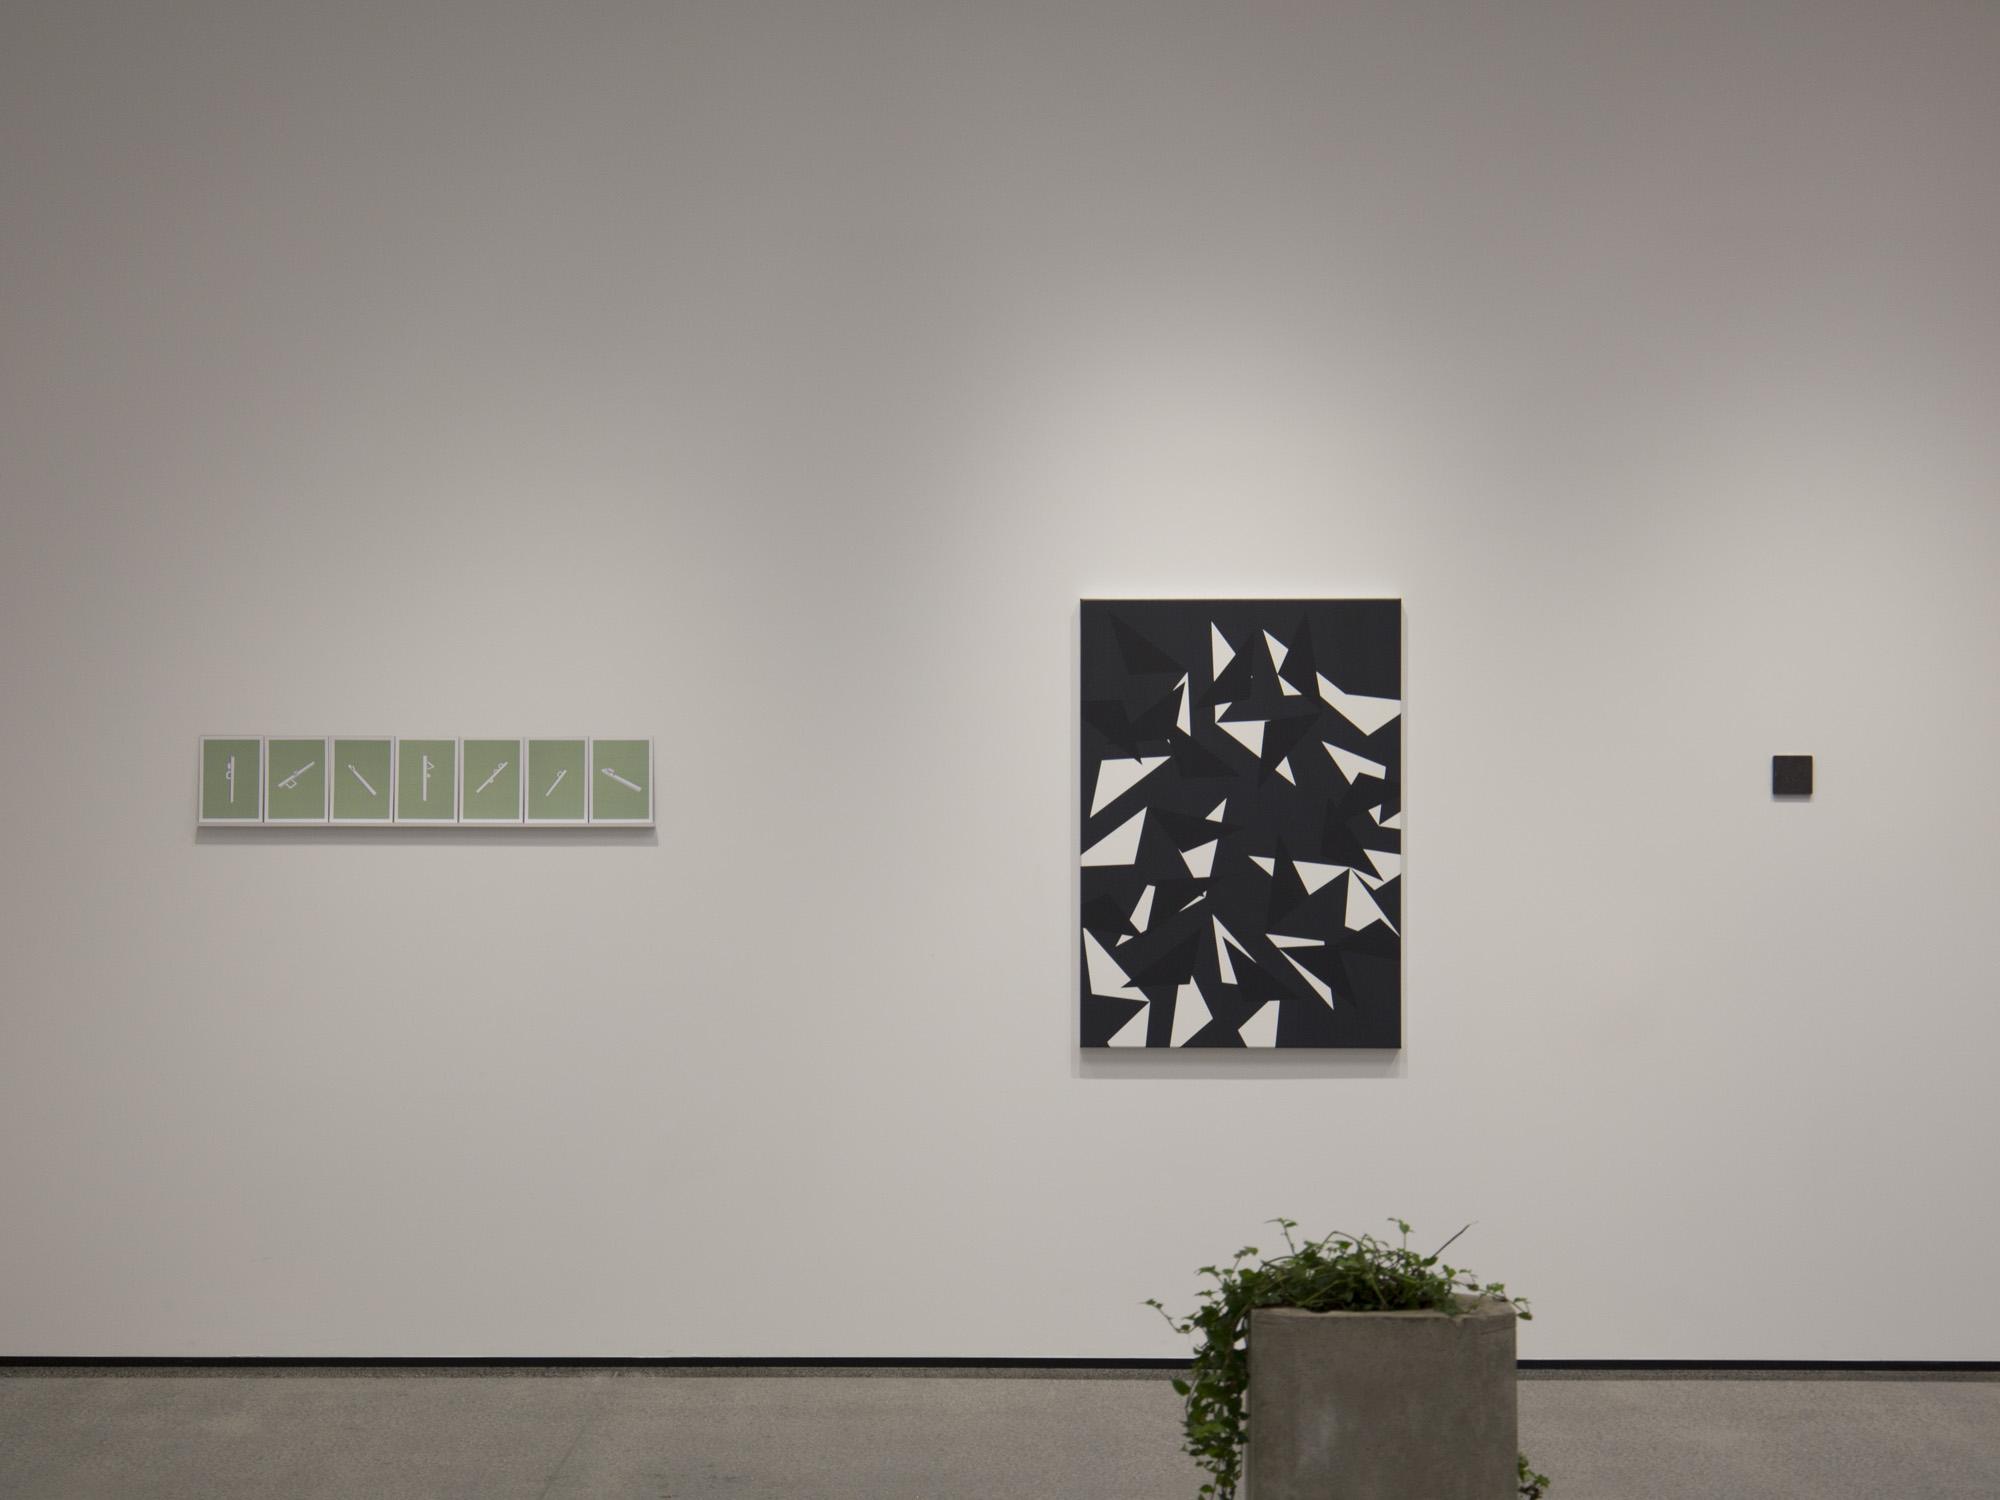 Clockwise from left: Shannon Novak,  Pianissimo 1–7 , 2016; Jeena Shin,  Motus 3 , 2014; Sarah Smuts-Kennedy,  Celestial Poles , 2015; Claudia Dunes,  Impluvium , 2016